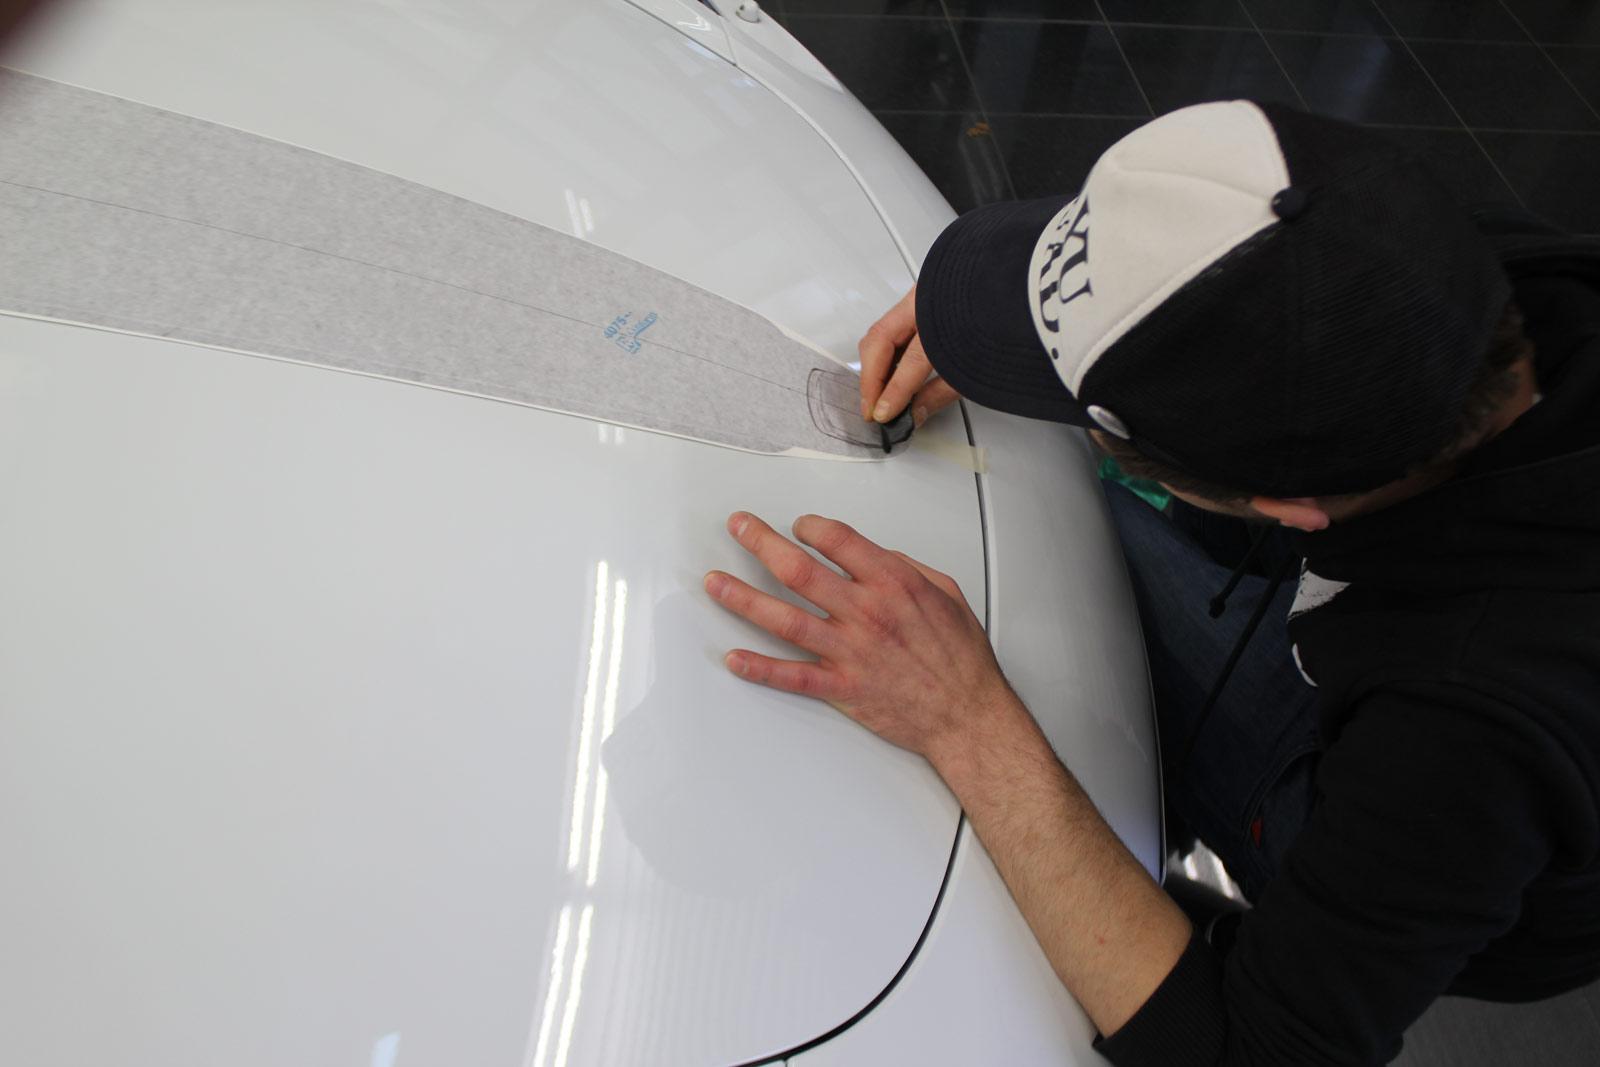 Porsche_Cayman_2014_weiss_Rallyestreifen_gunmetal_metallic_matt_mit_schwarz_matt_02